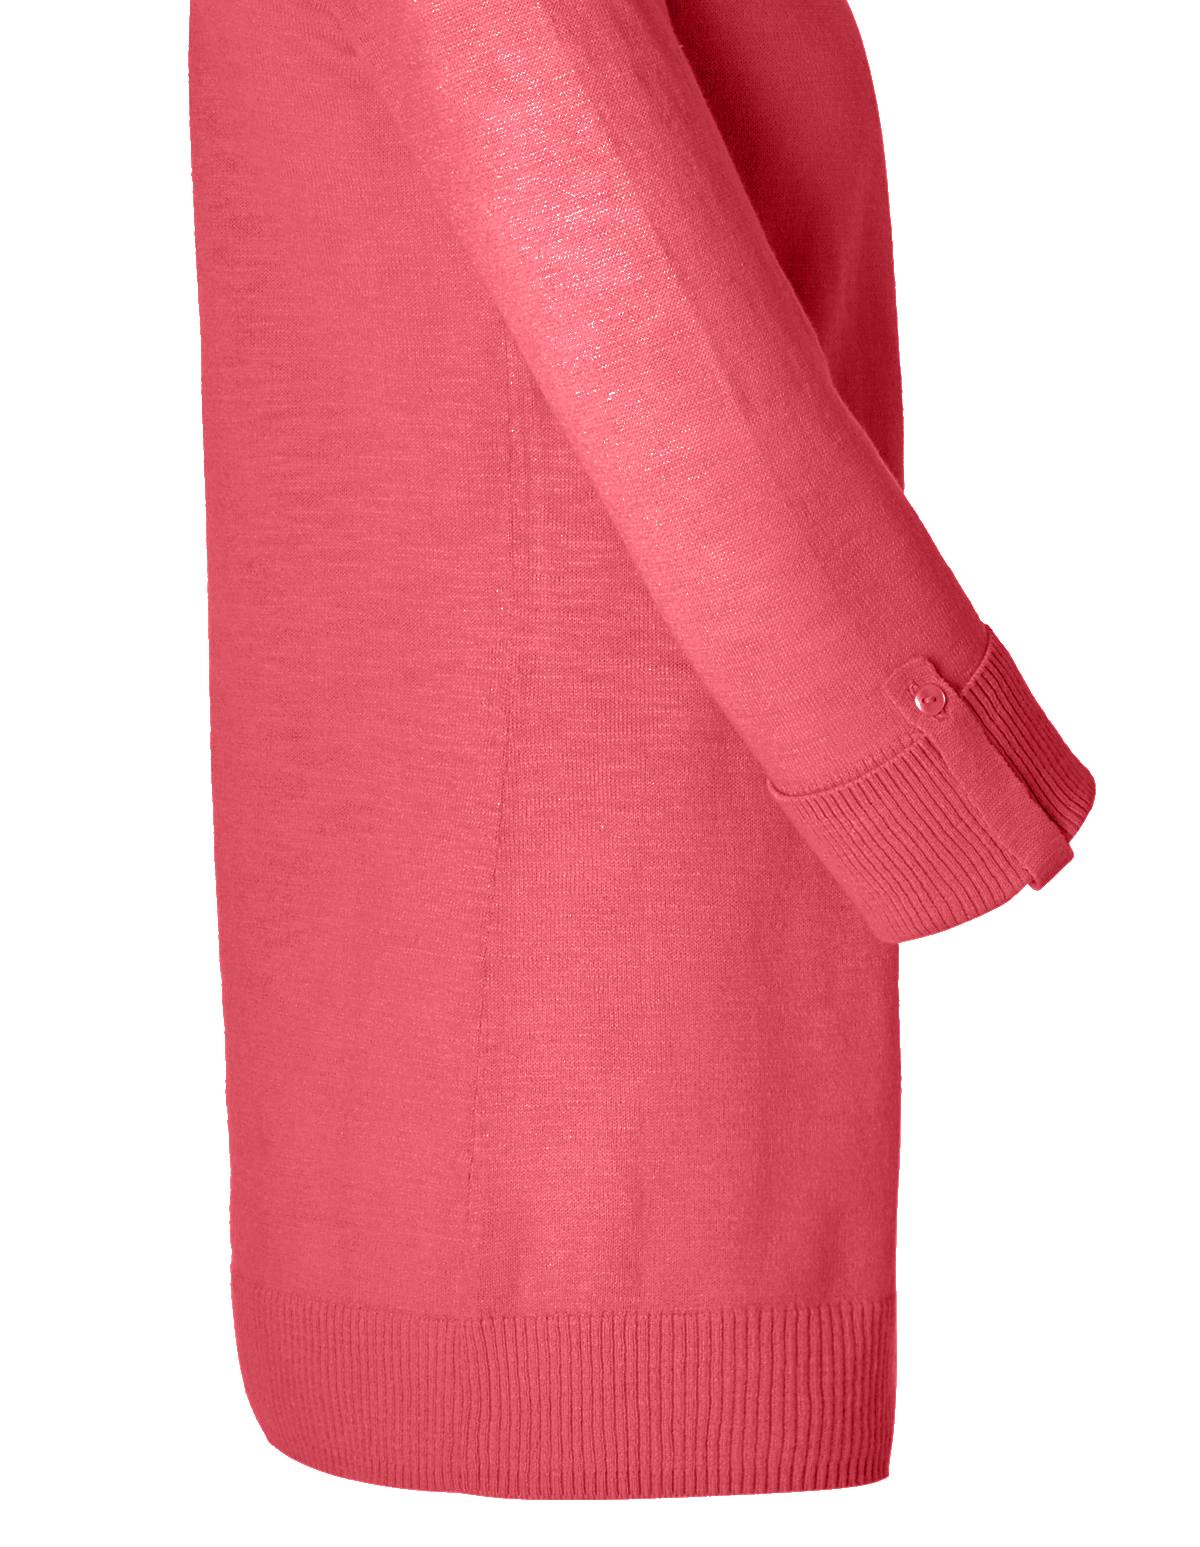 Coral Lightweight Cardigan Sweater | Cleo